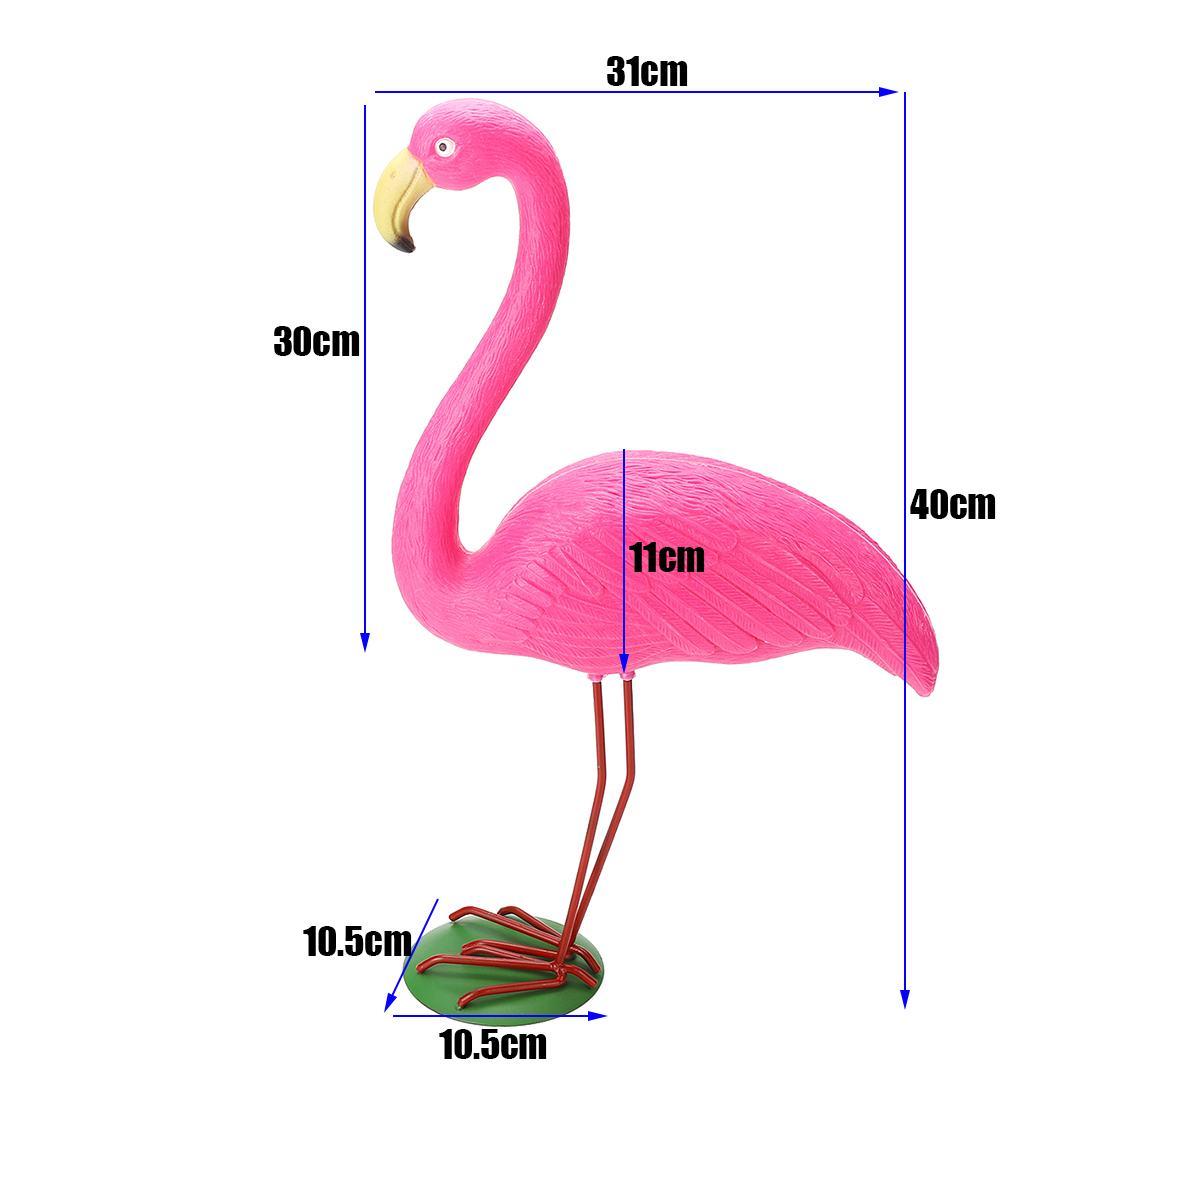 M Size 31x10.5x40cm Pink Flamingo Ornament Set Garden Resin + Metal Outdoor Lawn Light Decoration Ornament Home Garden Yard Room